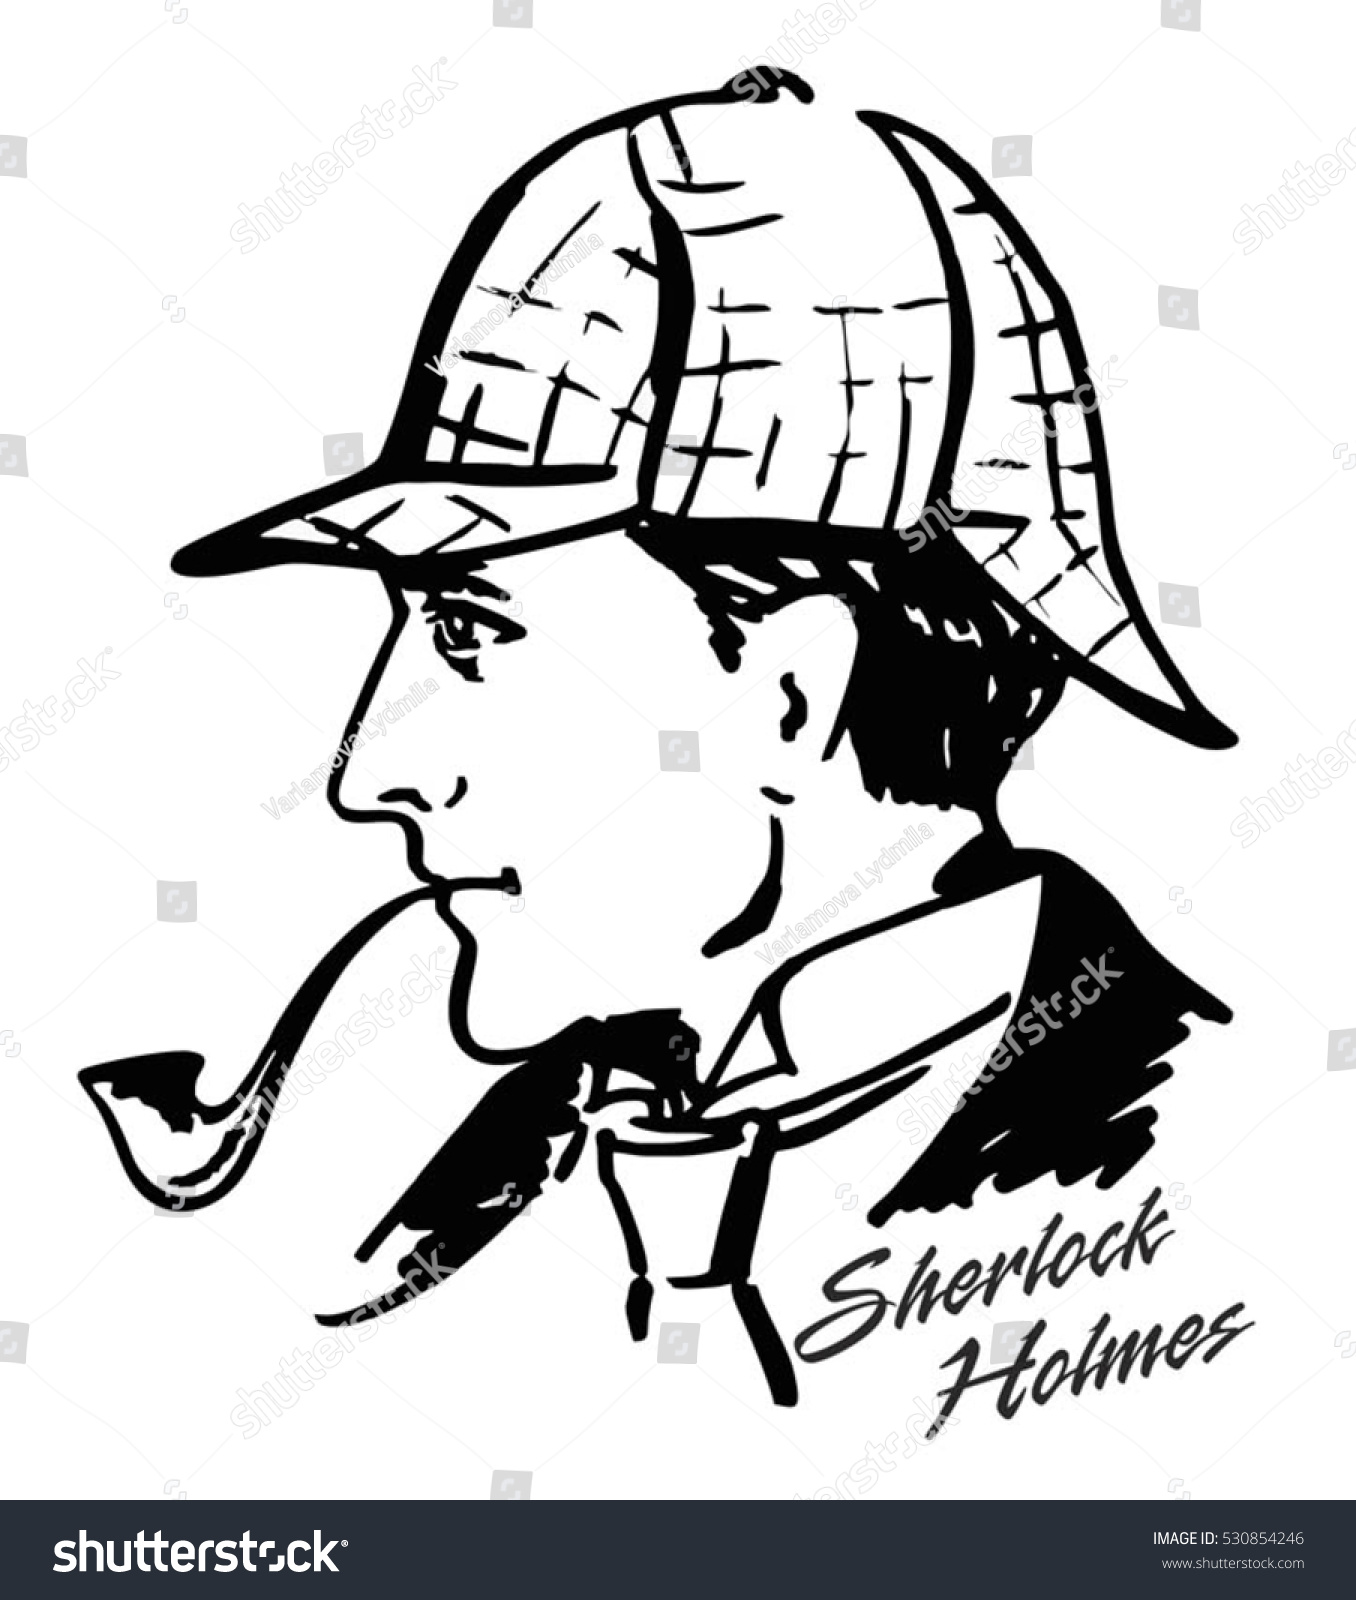 detective illustration illustration with sherlock holmes english detective ink drawing